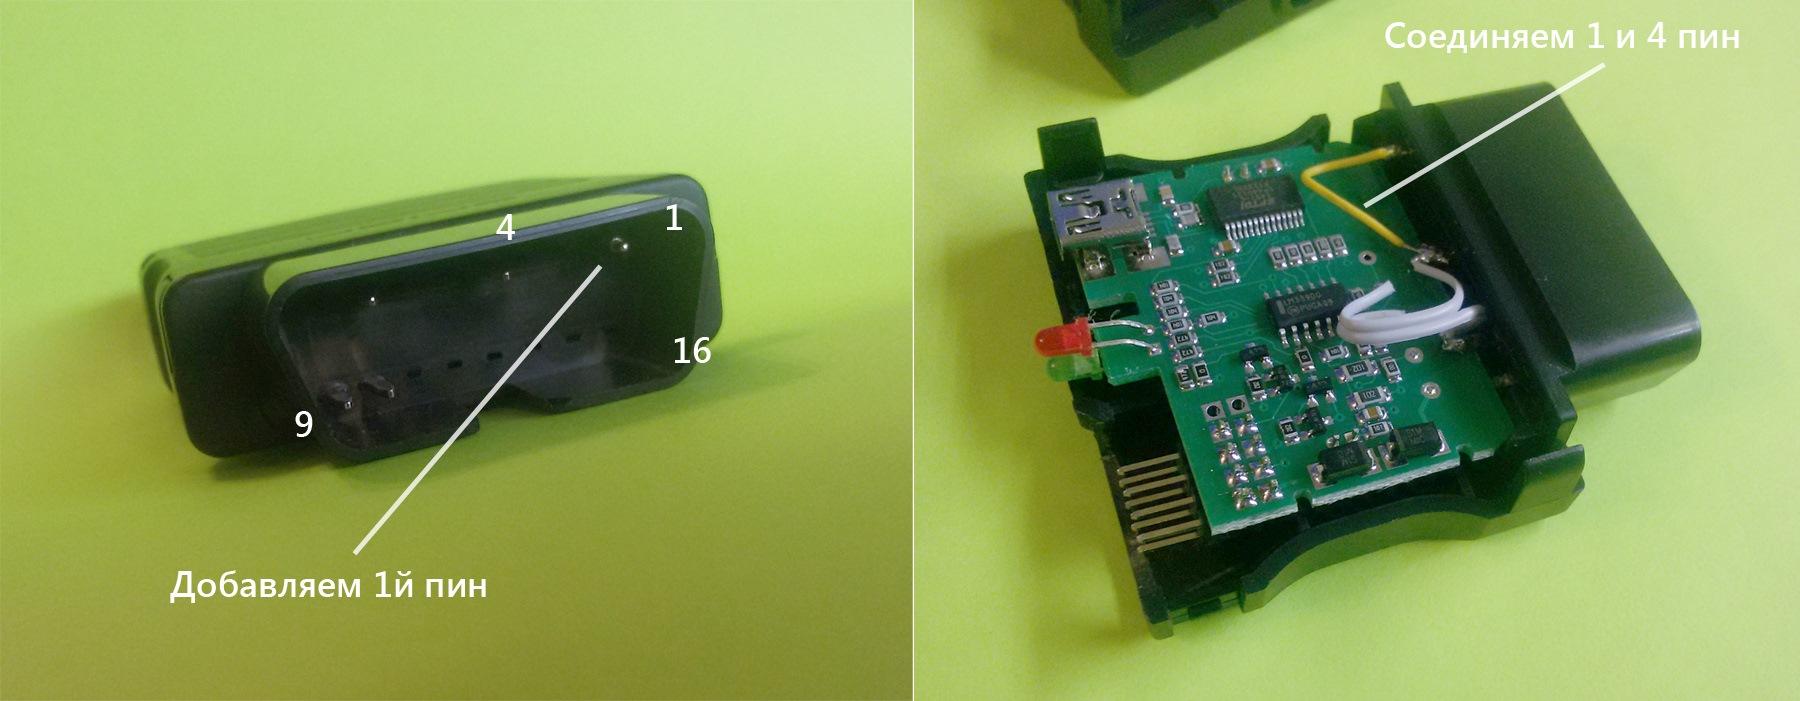 kl-line адаптер usb для mitsubishi open port